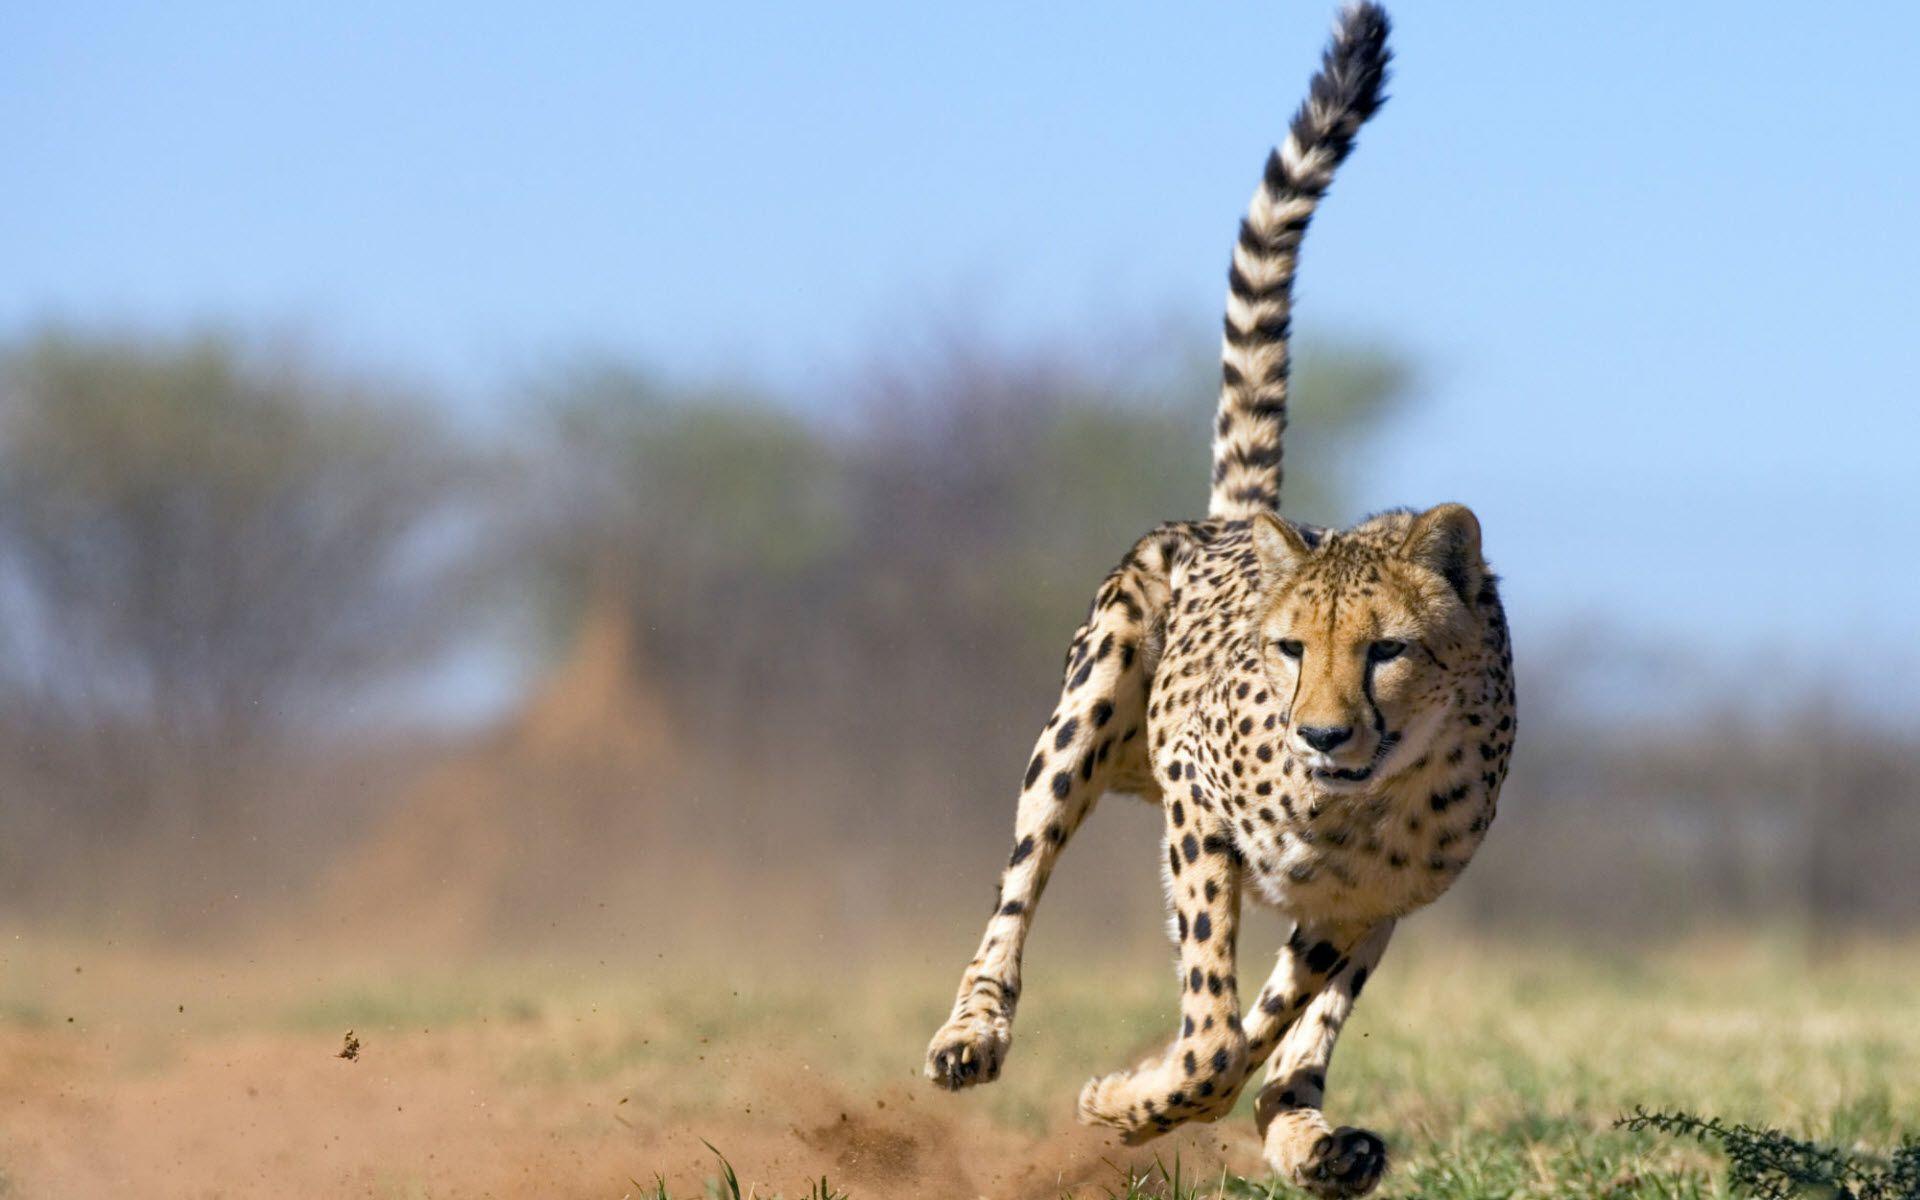 Cheetah - Big kucing wallpaper (40609285) - fanpop